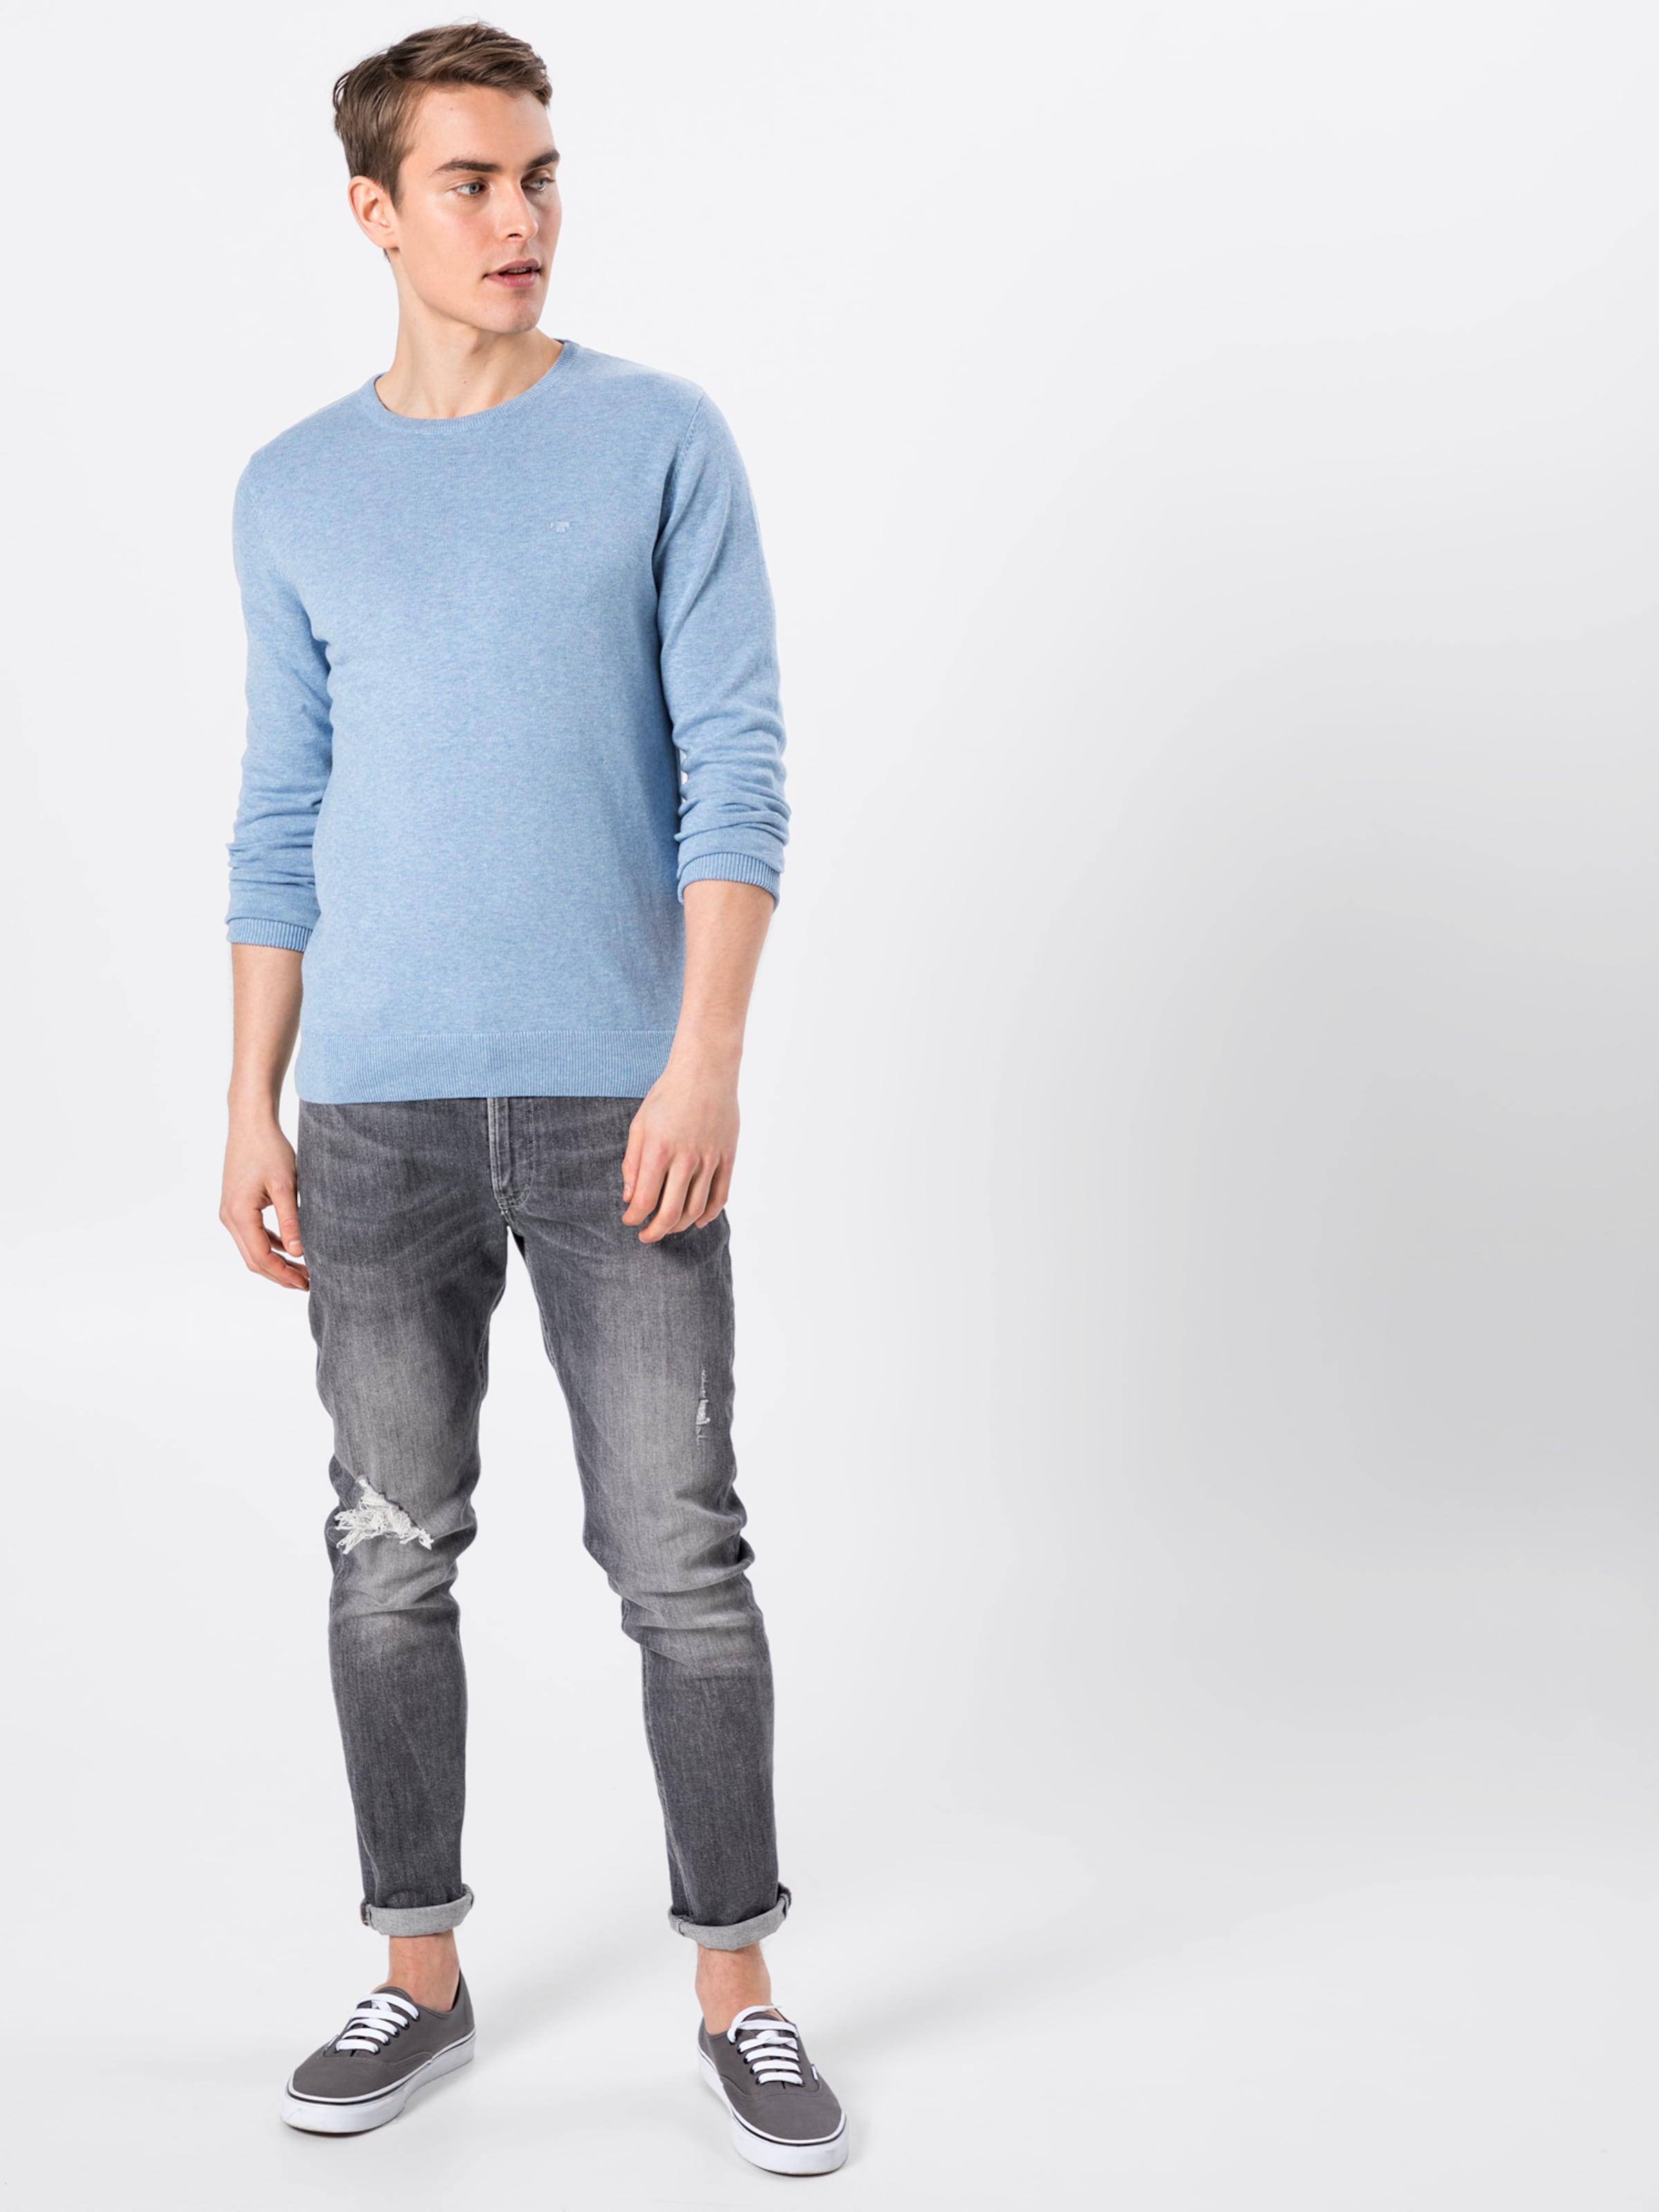 Tom Tailor Crewneck Pullover 'modern 1 In Basic Hellblau 1' Style m0Nvnw8